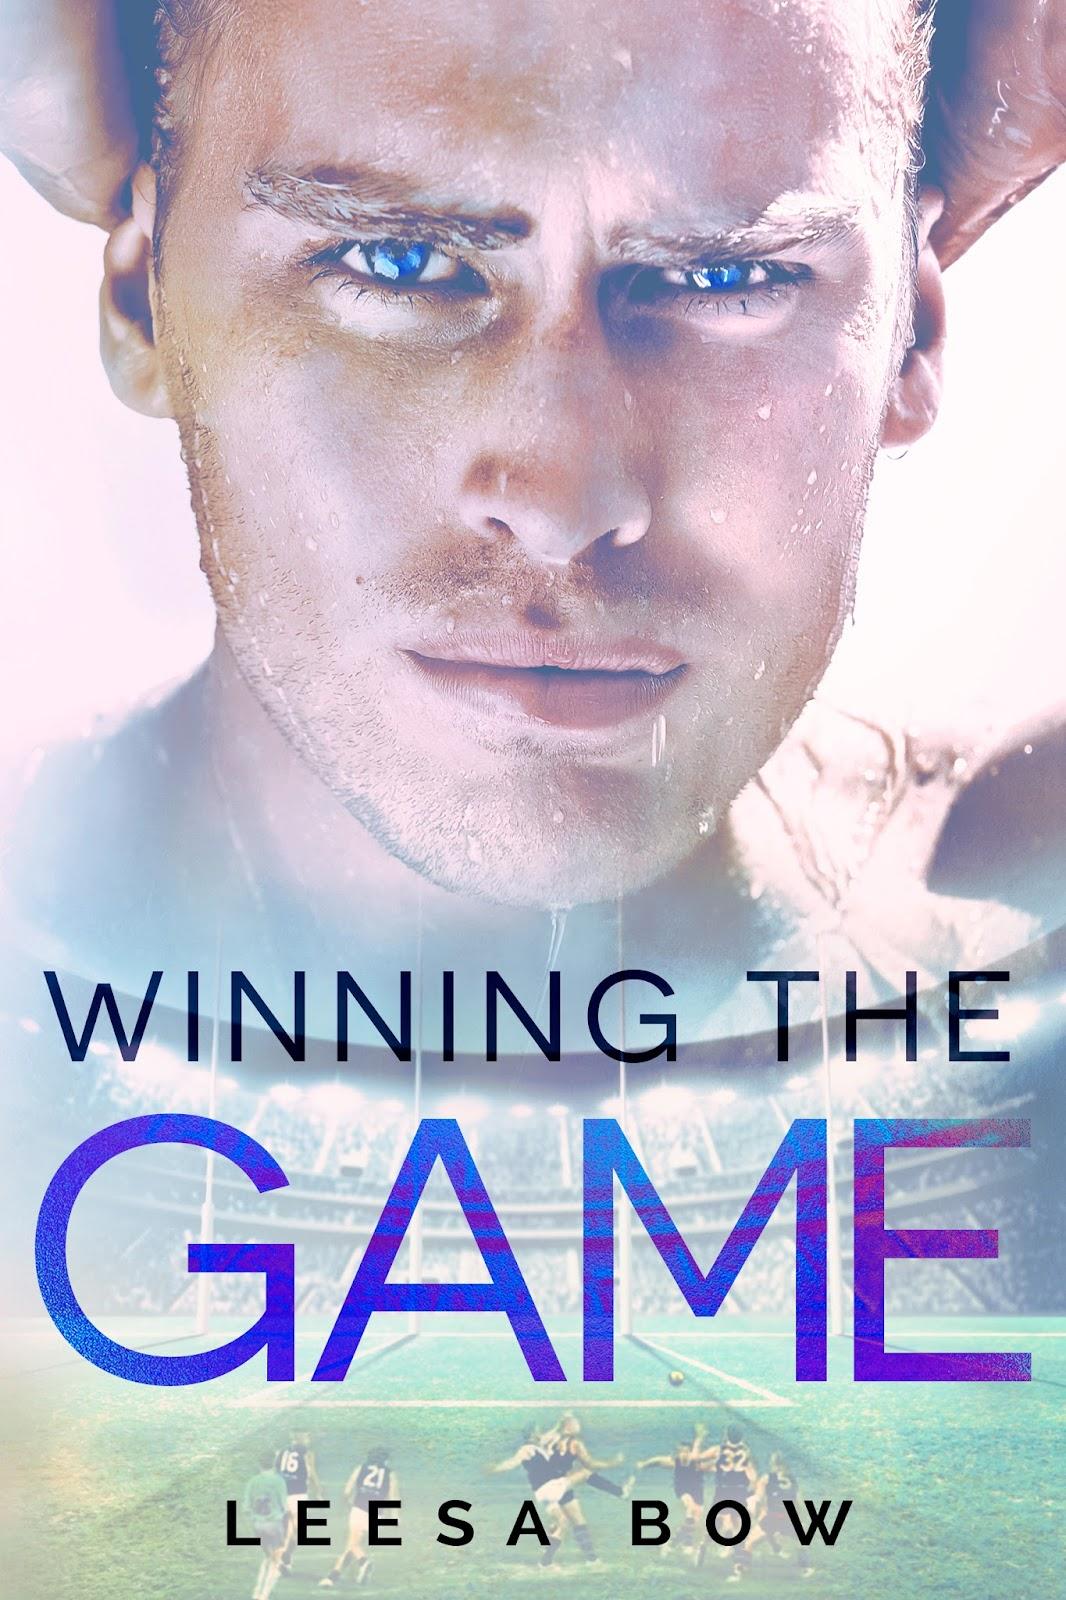 WinningtheGame.Ebook.jpg